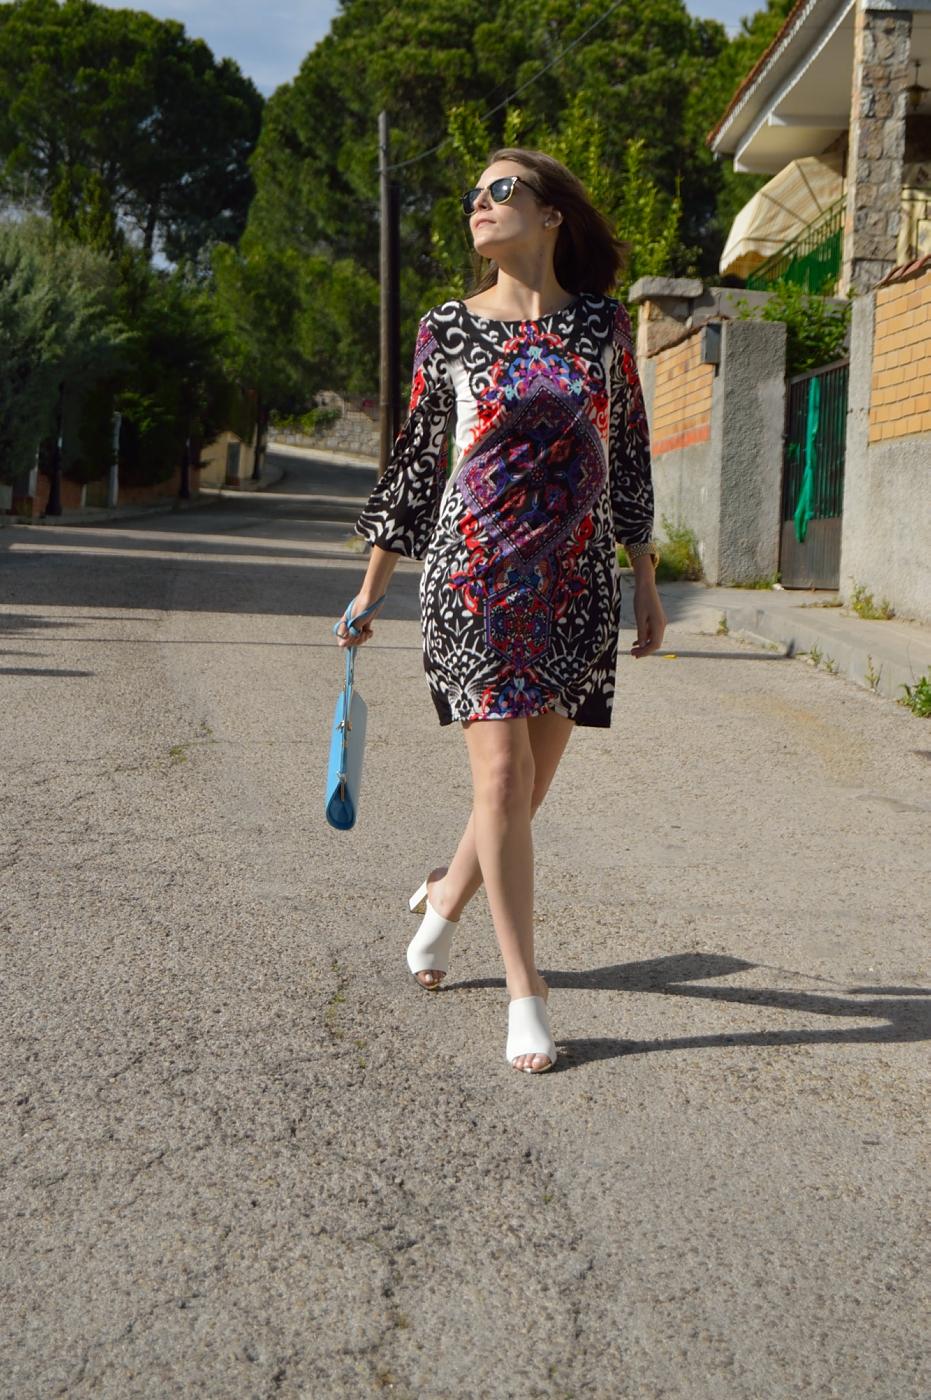 lara-vazquez-madlula-look-fashion-blog-girl-on-heels